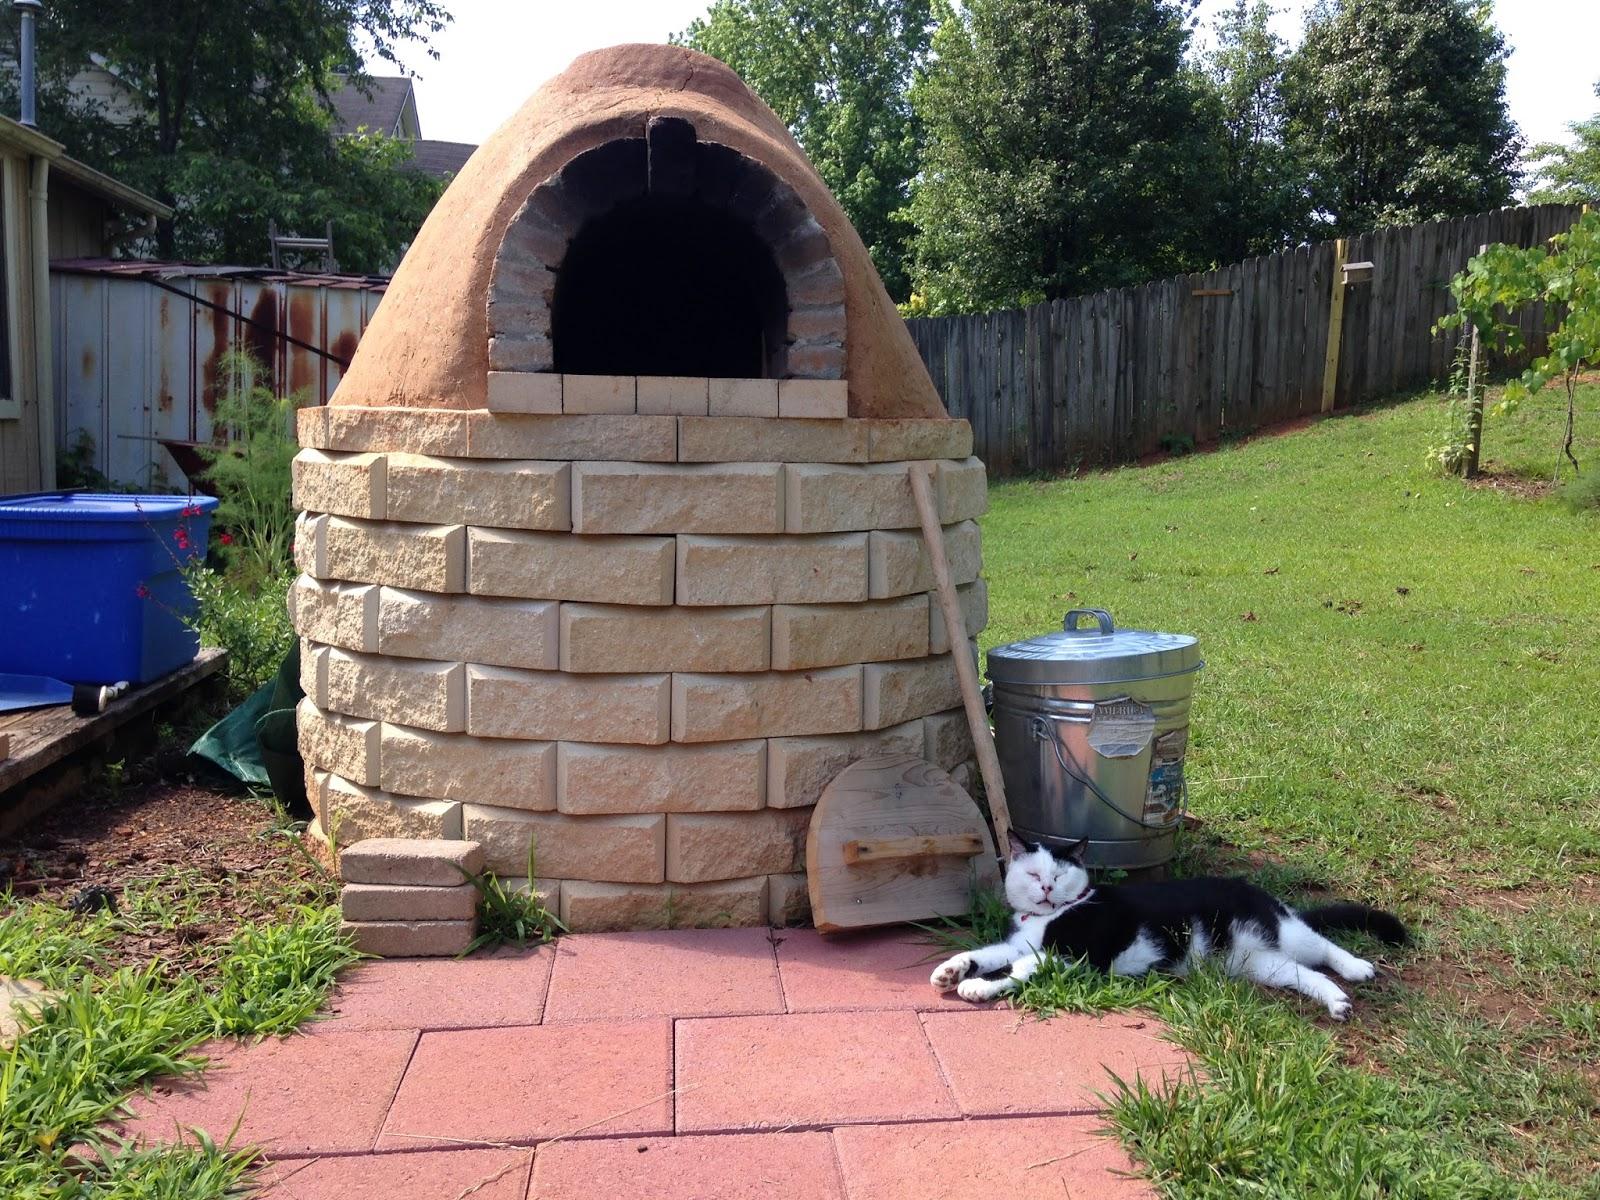 kiko denzer build your own earth oven pdf